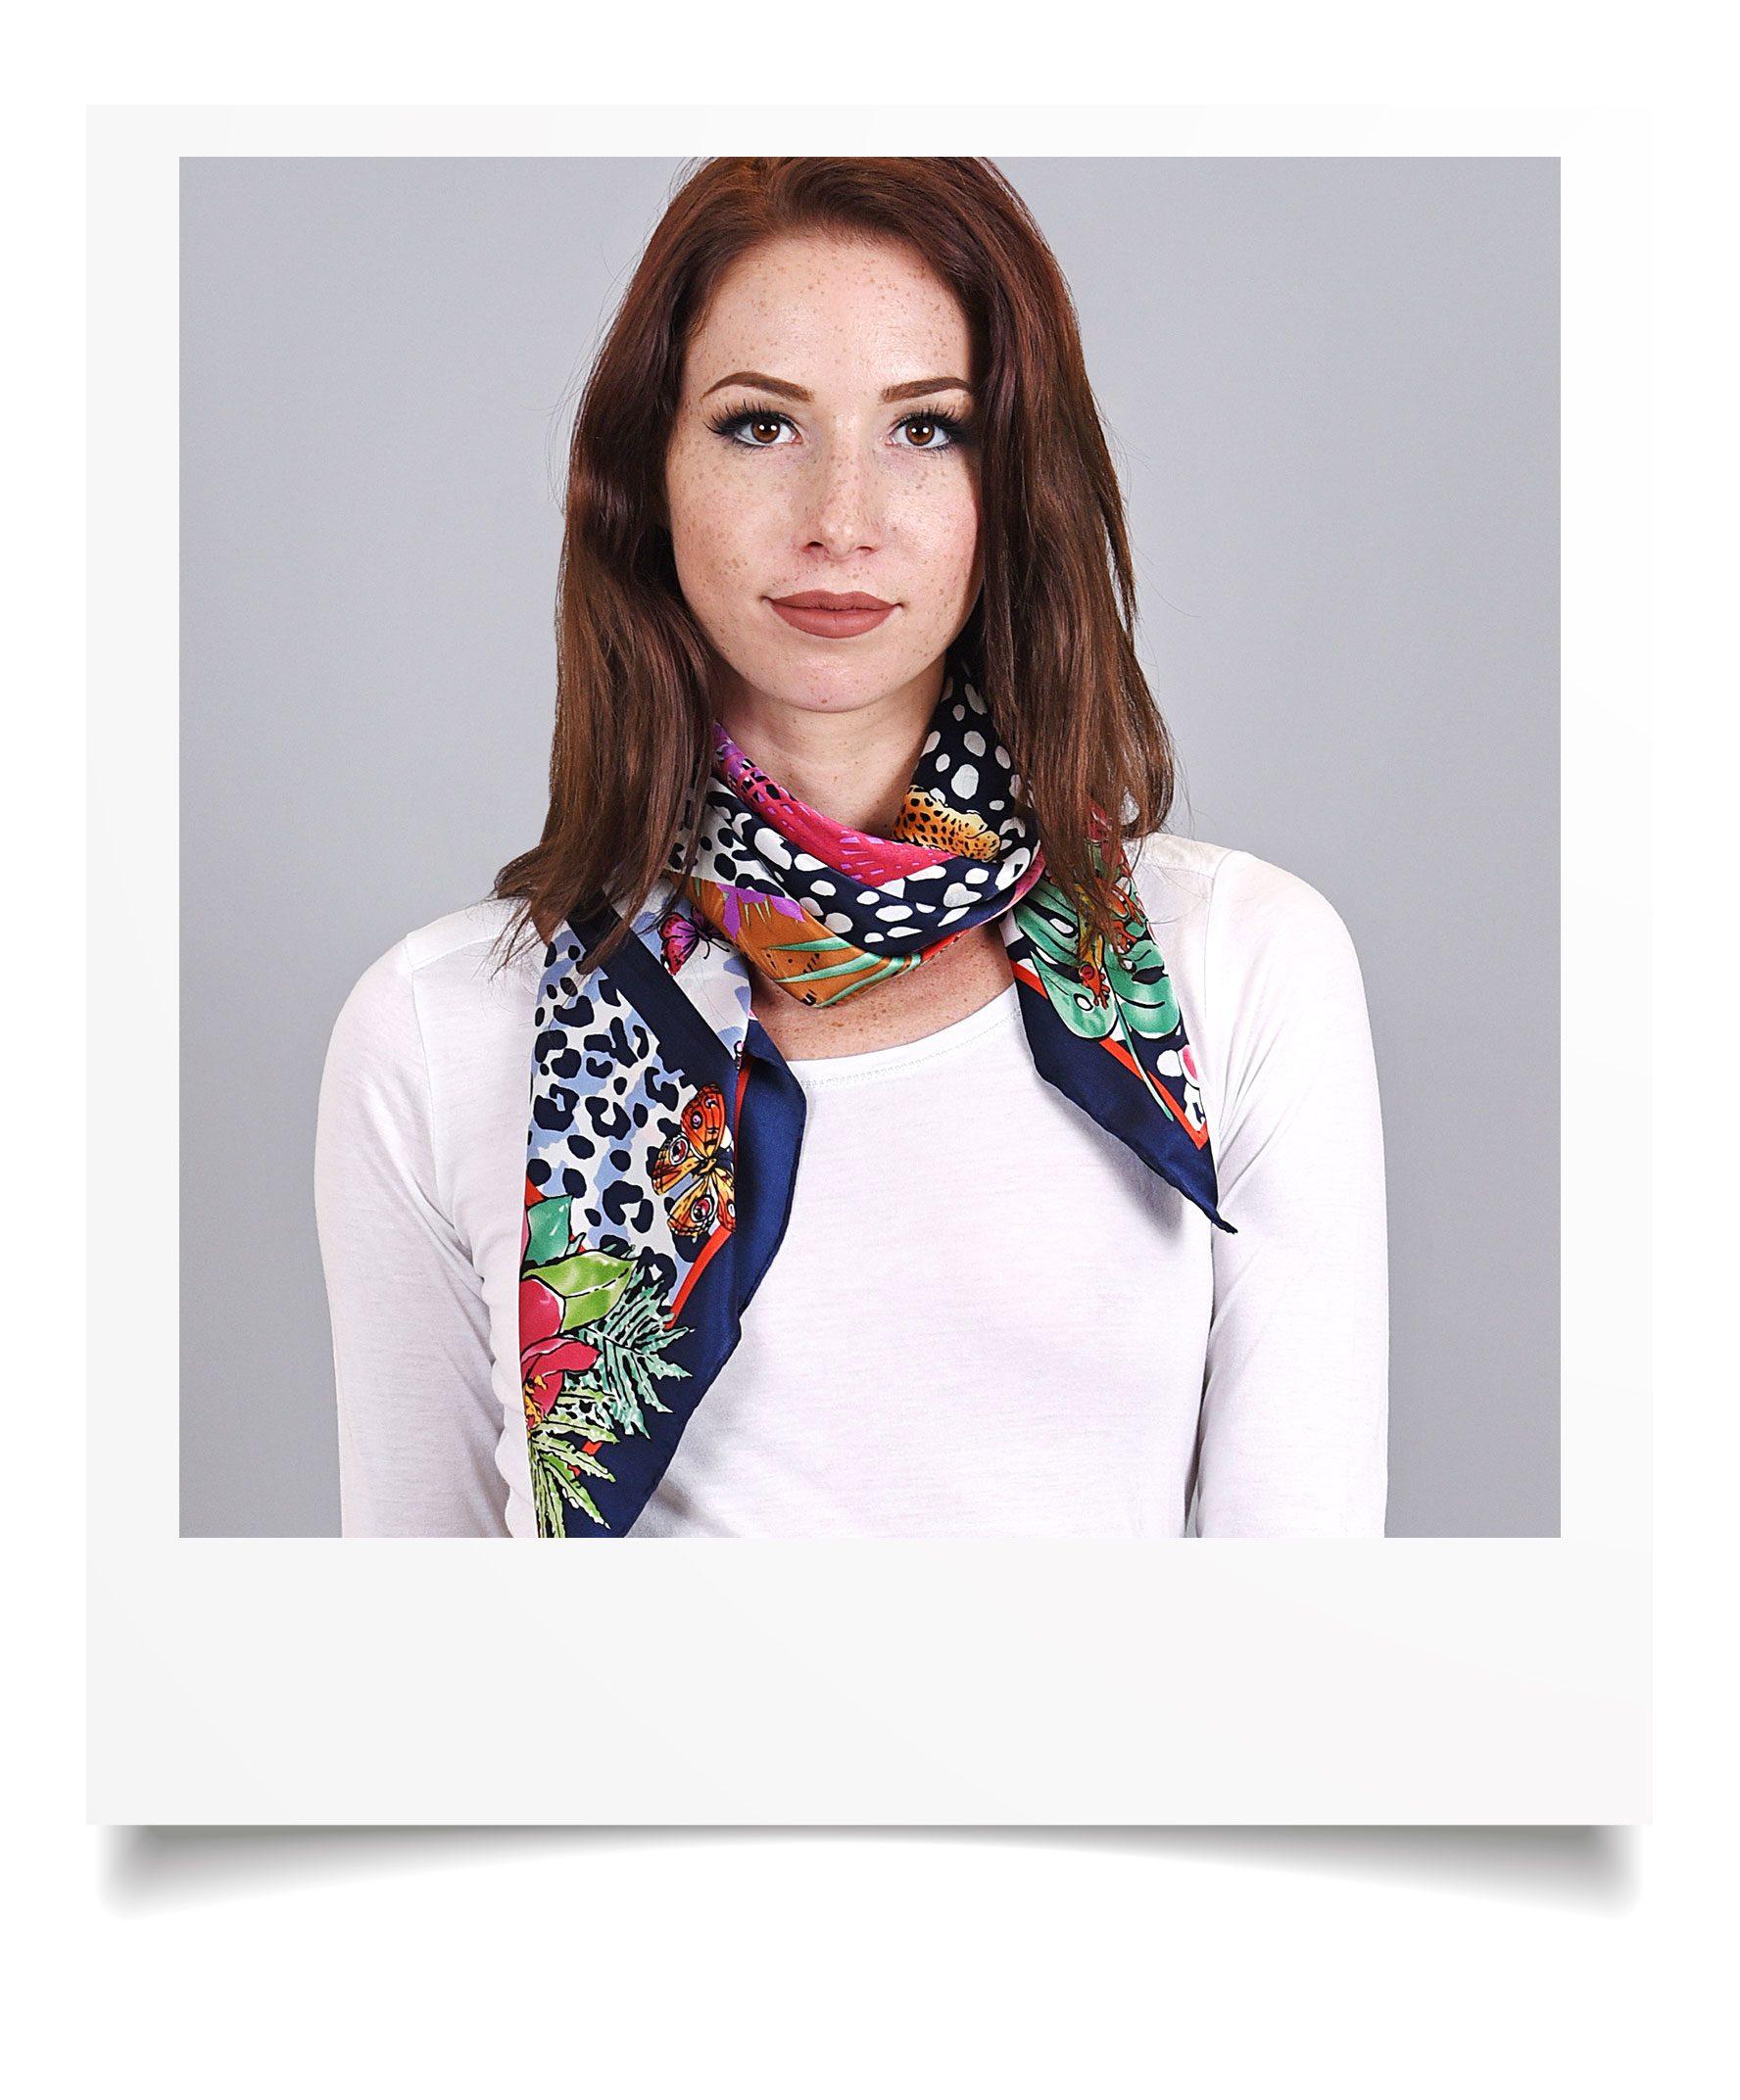 http://lookbook.allee-du-foulard.fr/wp-content/uploads/2018/09/0695-8-ADF-Accessoires-de-mode-LB-Selection_leopard-carre-soie-tigre-1776x2144.jpg